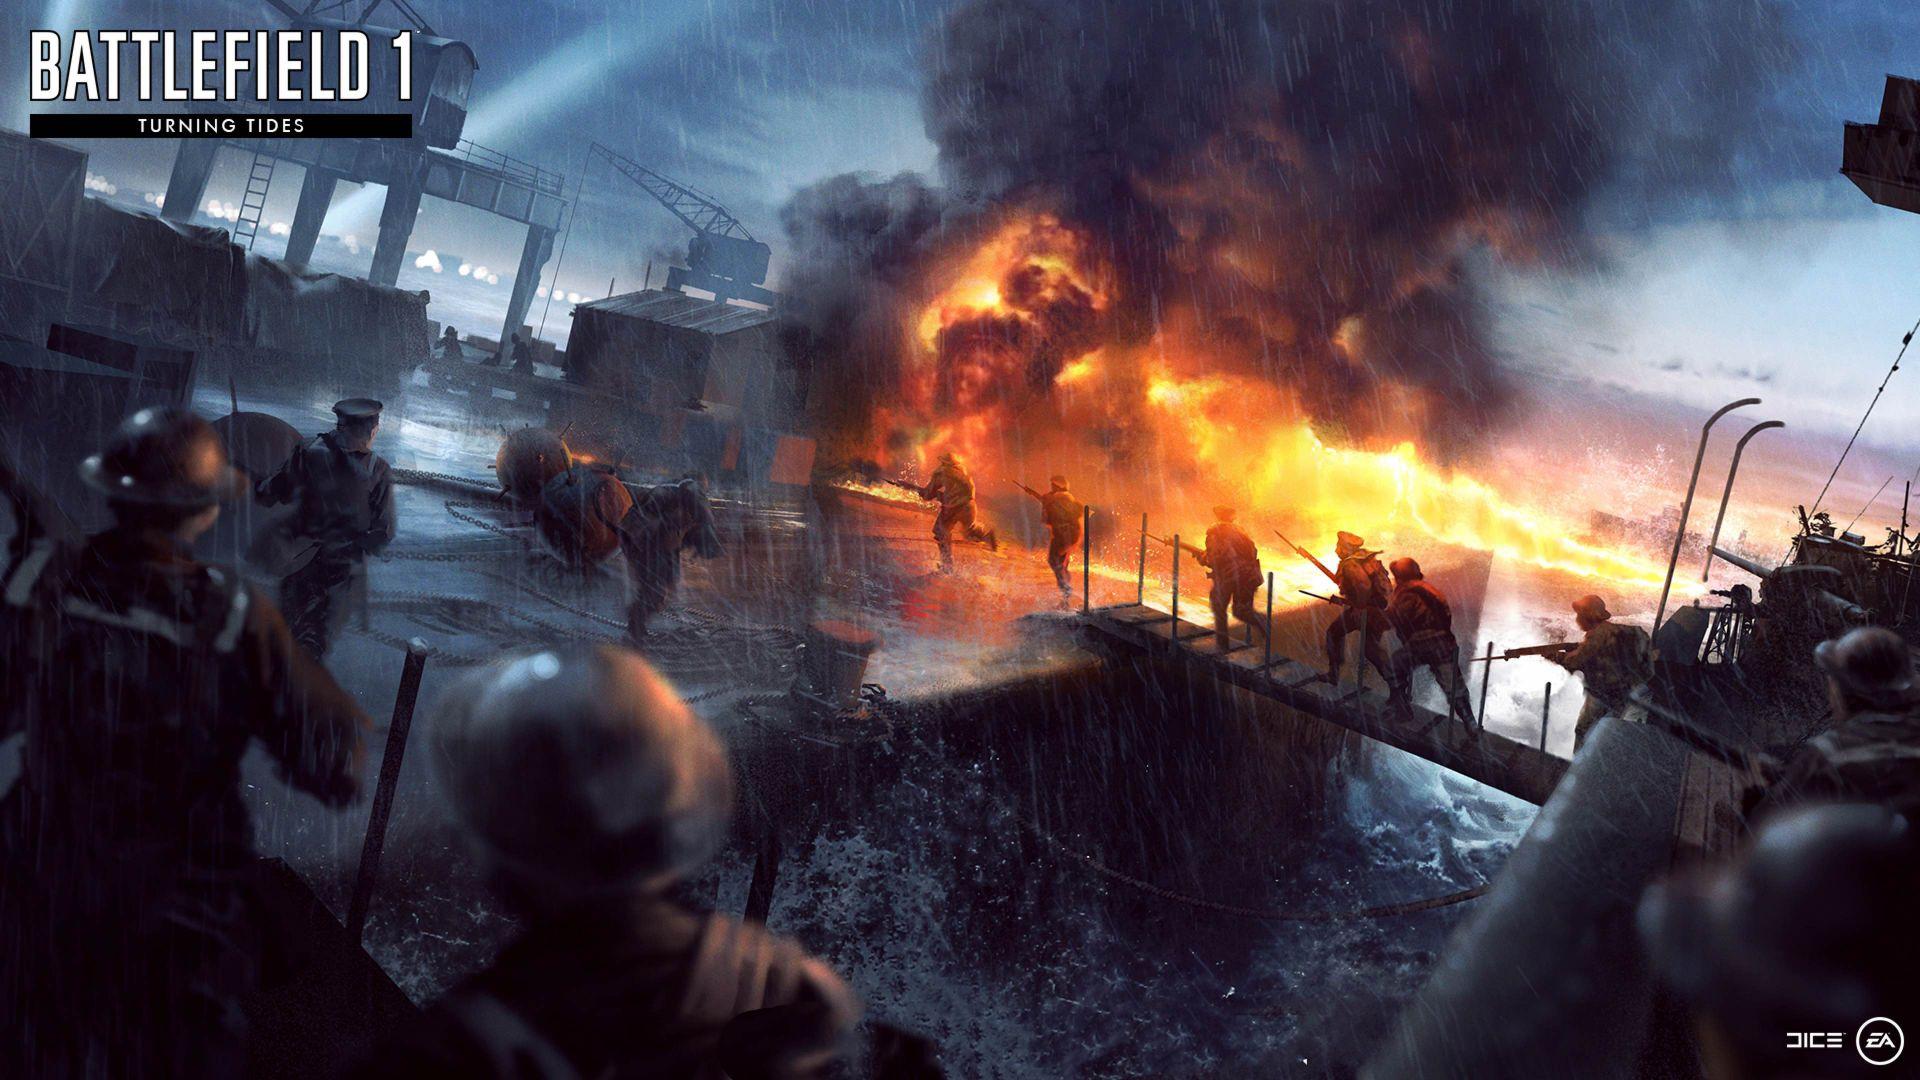 Wallpaper Battlefield 1: Turning Tides DLC, video game, 4k